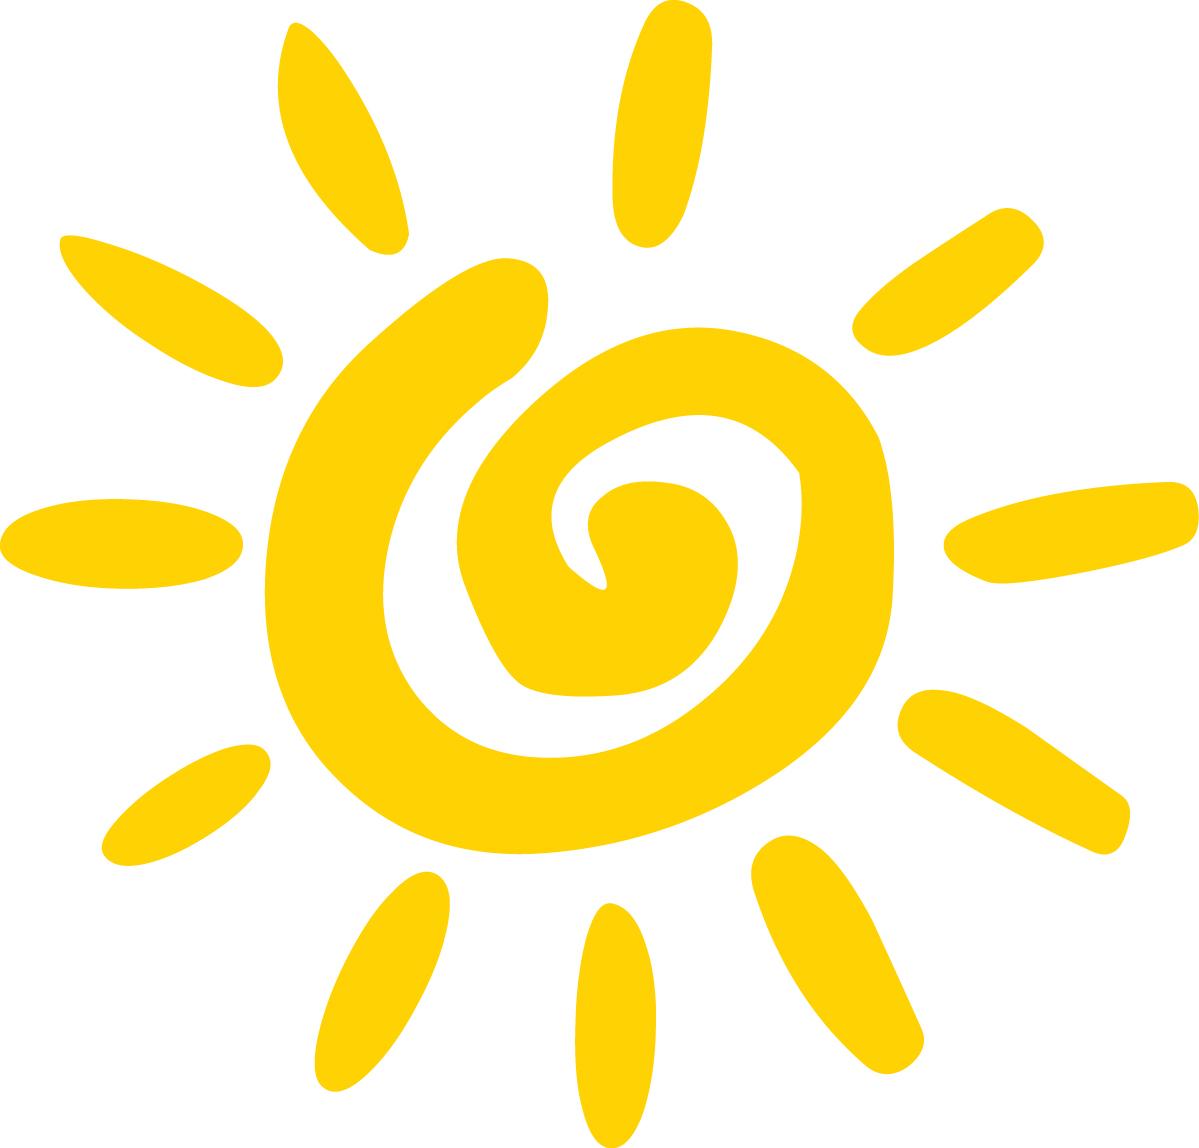 Clip Art Free Sun Clipart free sunshine clipart kid sun images at clker com vector clip art online